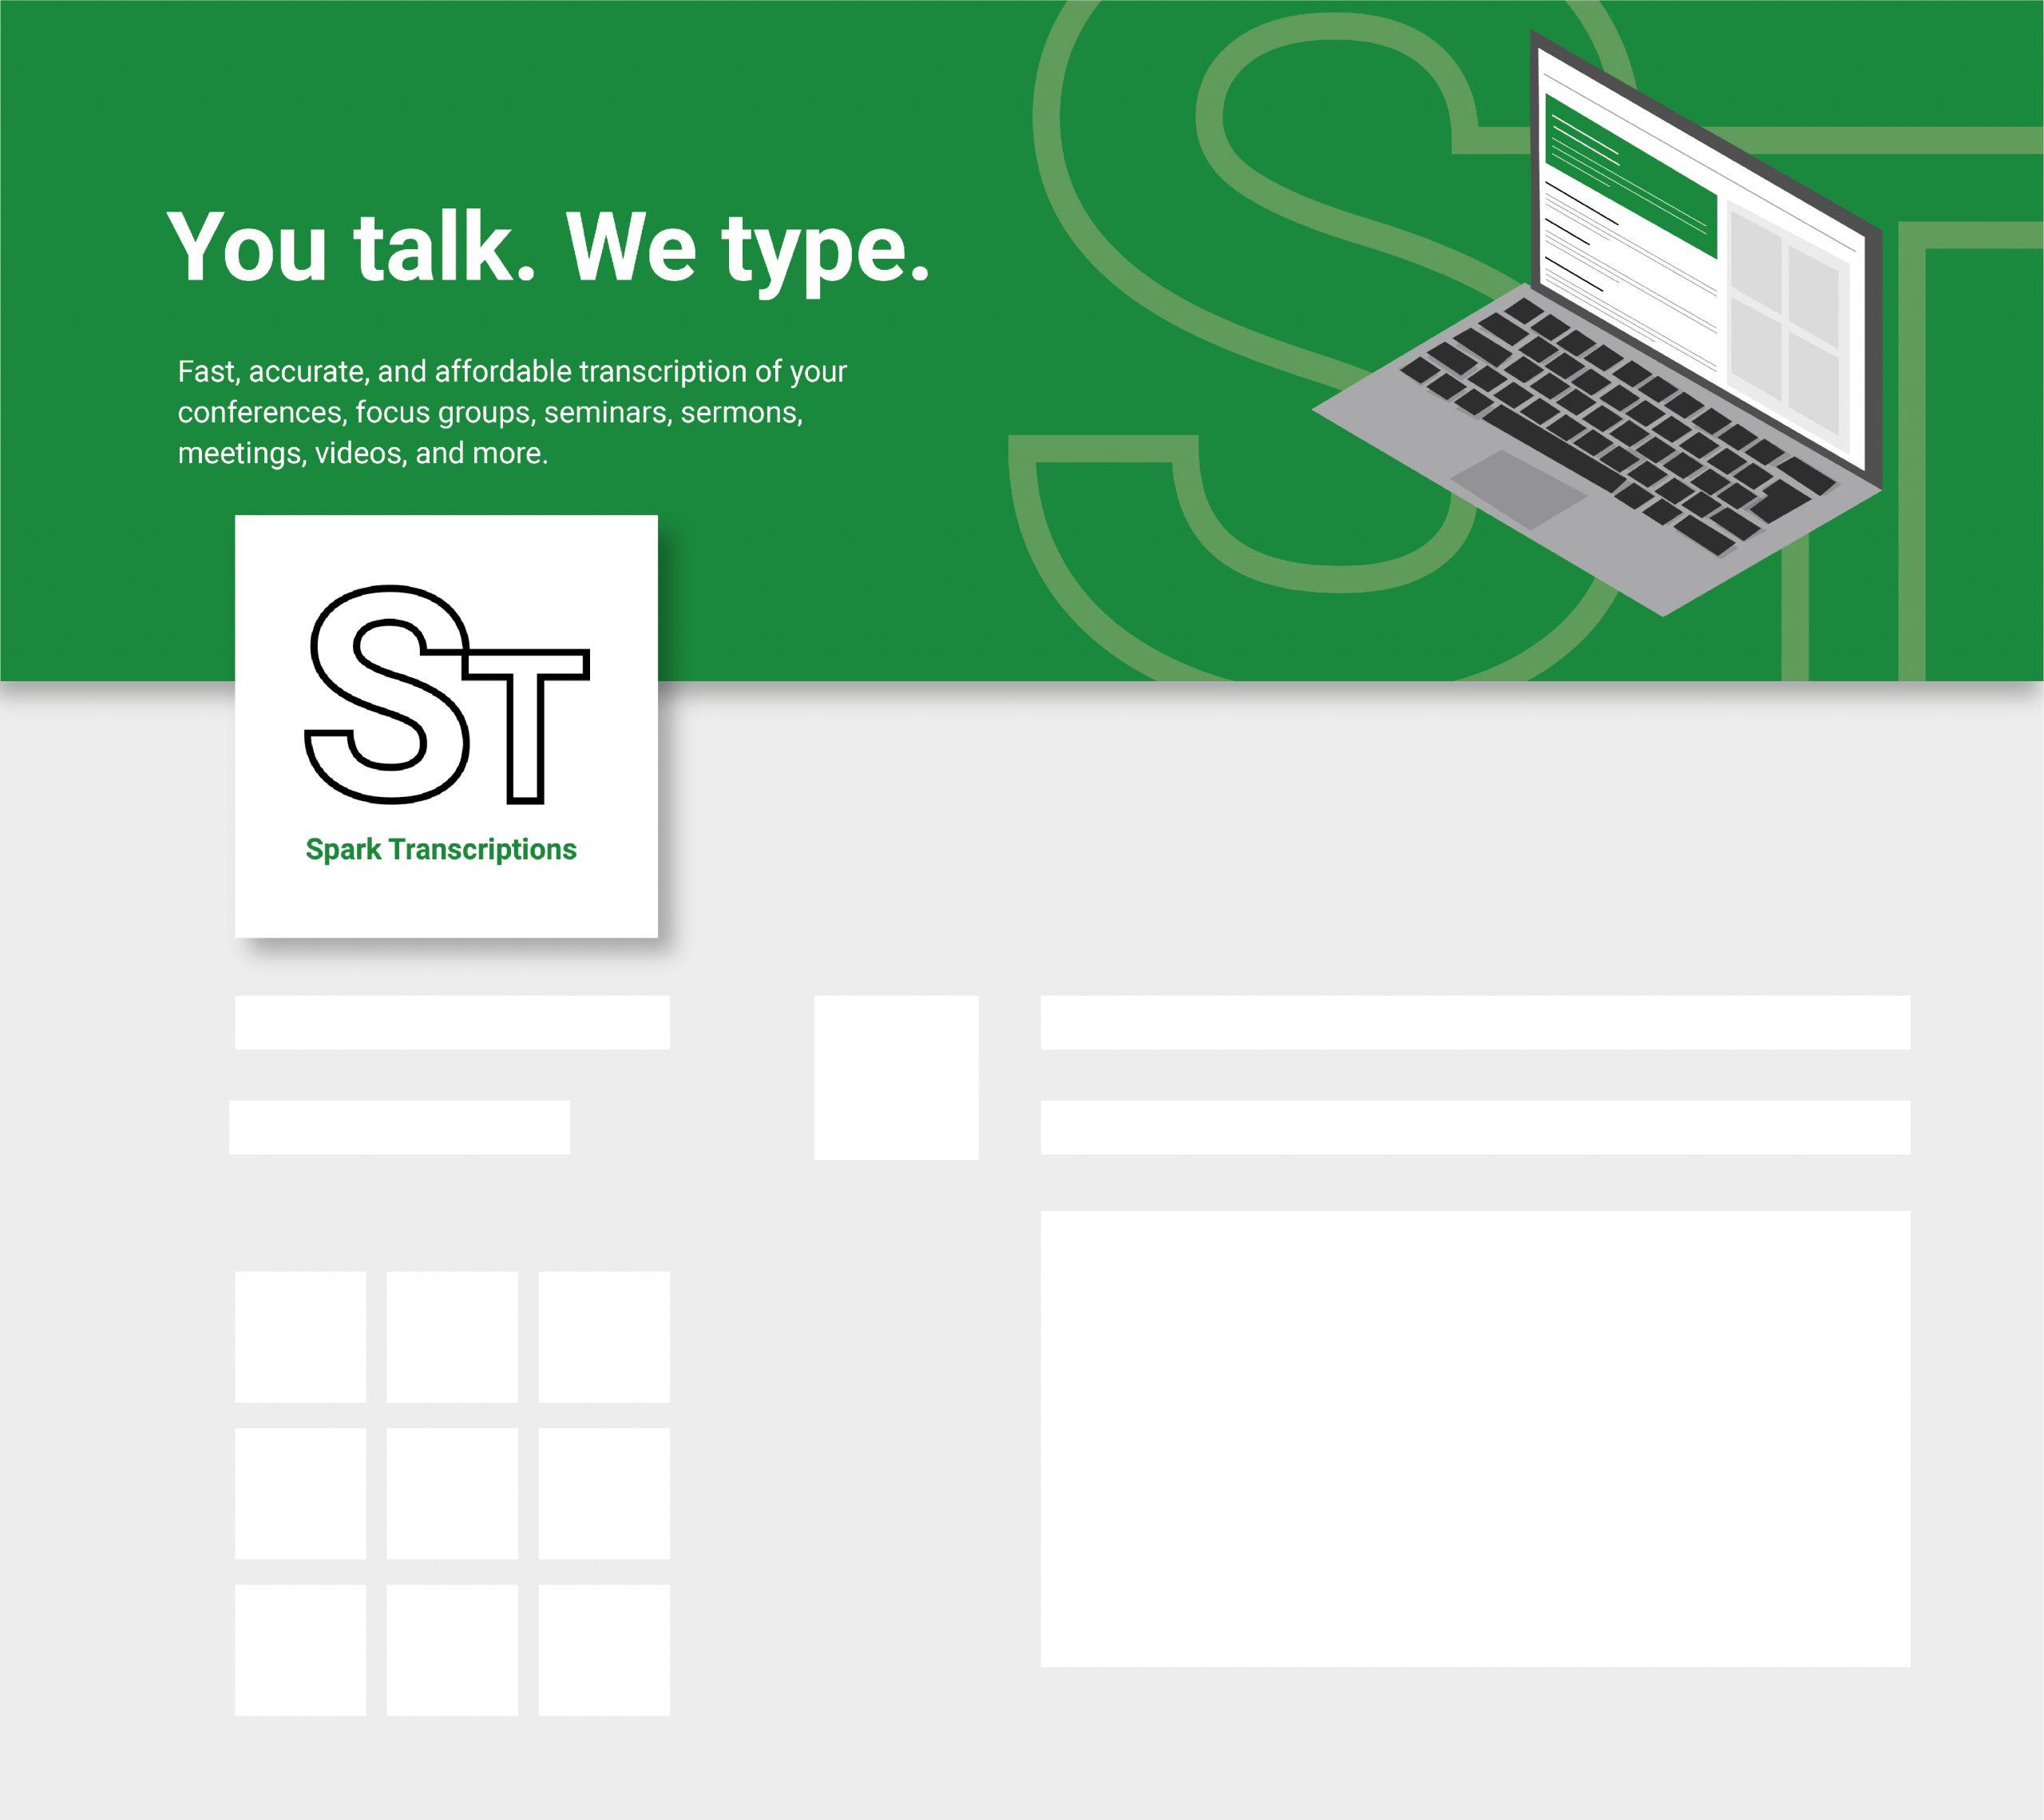 Spar-Trancriptions-social-media-page-01-1